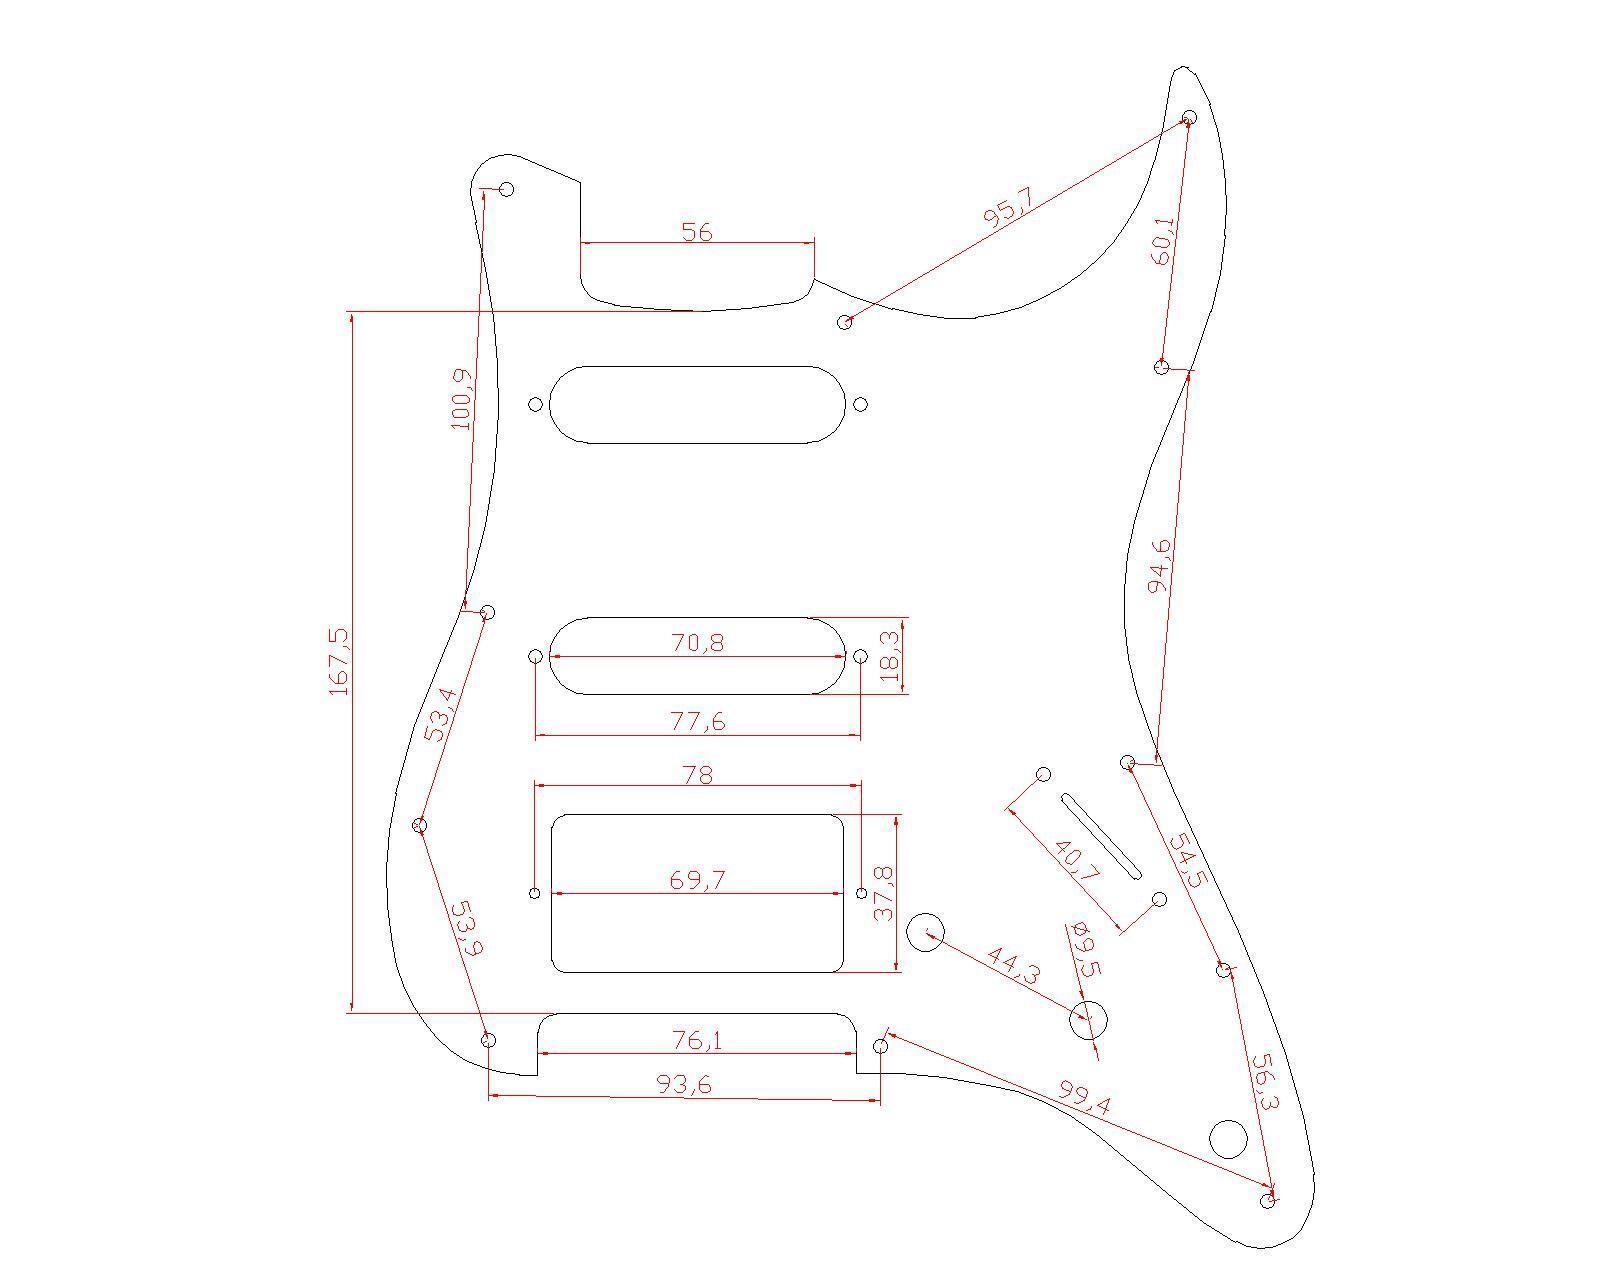 Mirror Pickguard Ssh Pickups 11 Hole For Fender Strat